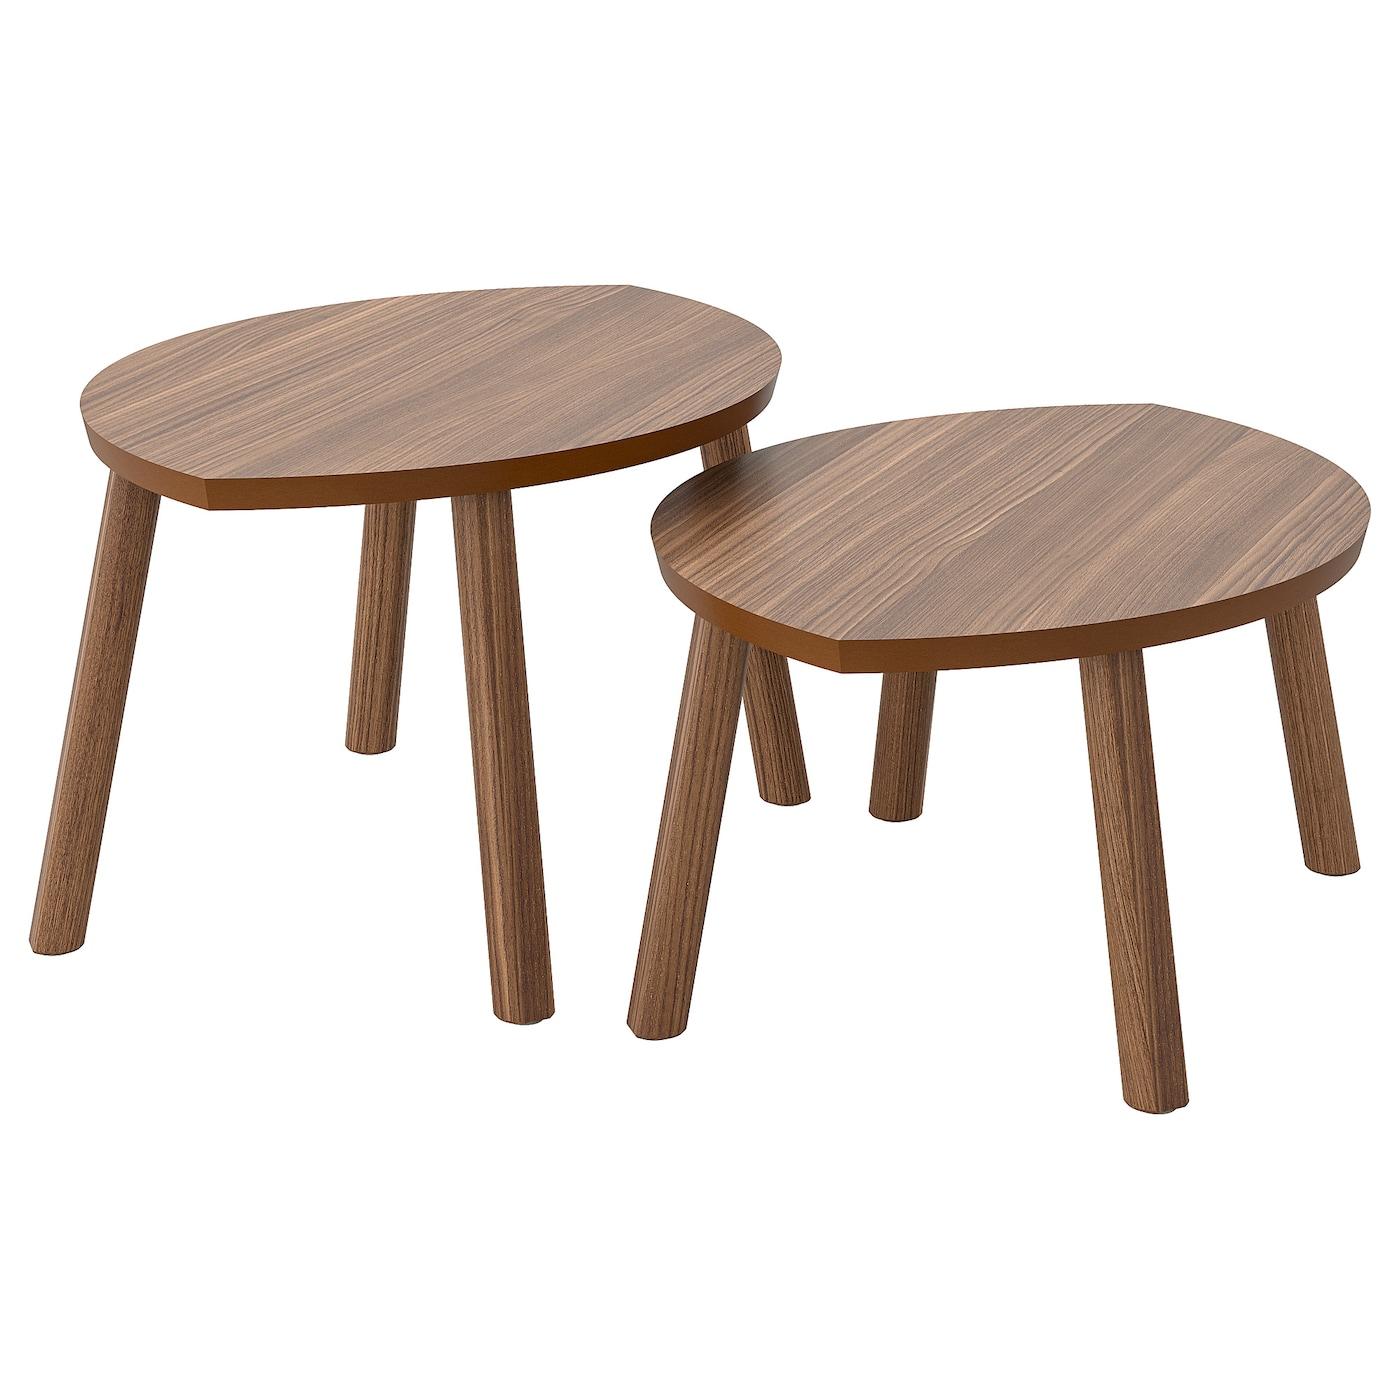 STOCKHOLM Nest of tables, set of 2 walnut veneer